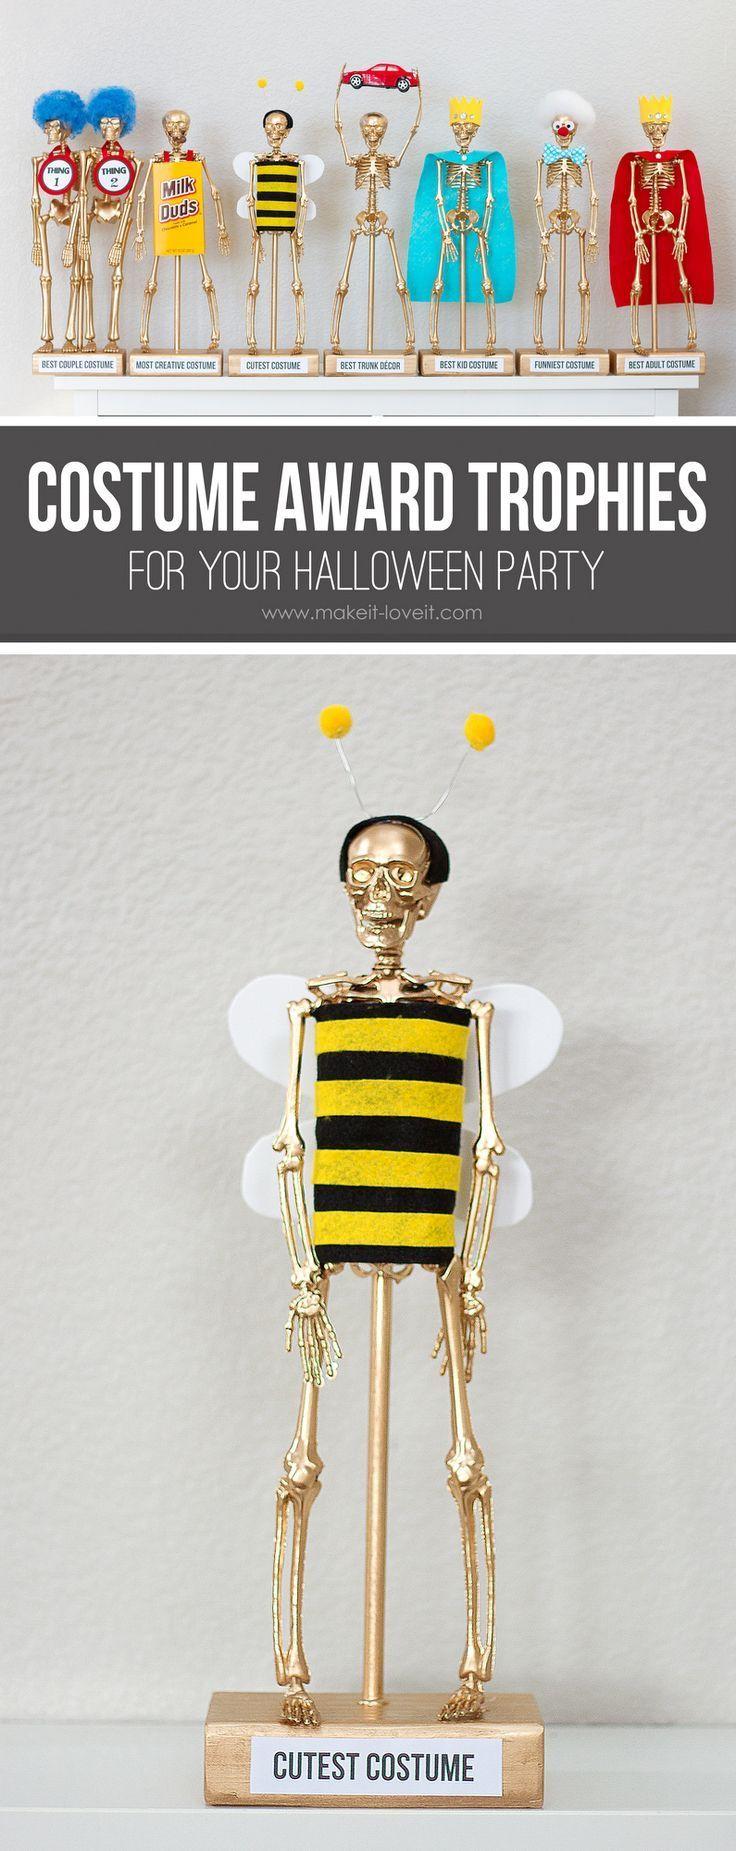 59 best images about Halloween on Pinterest | Halloween skull ...